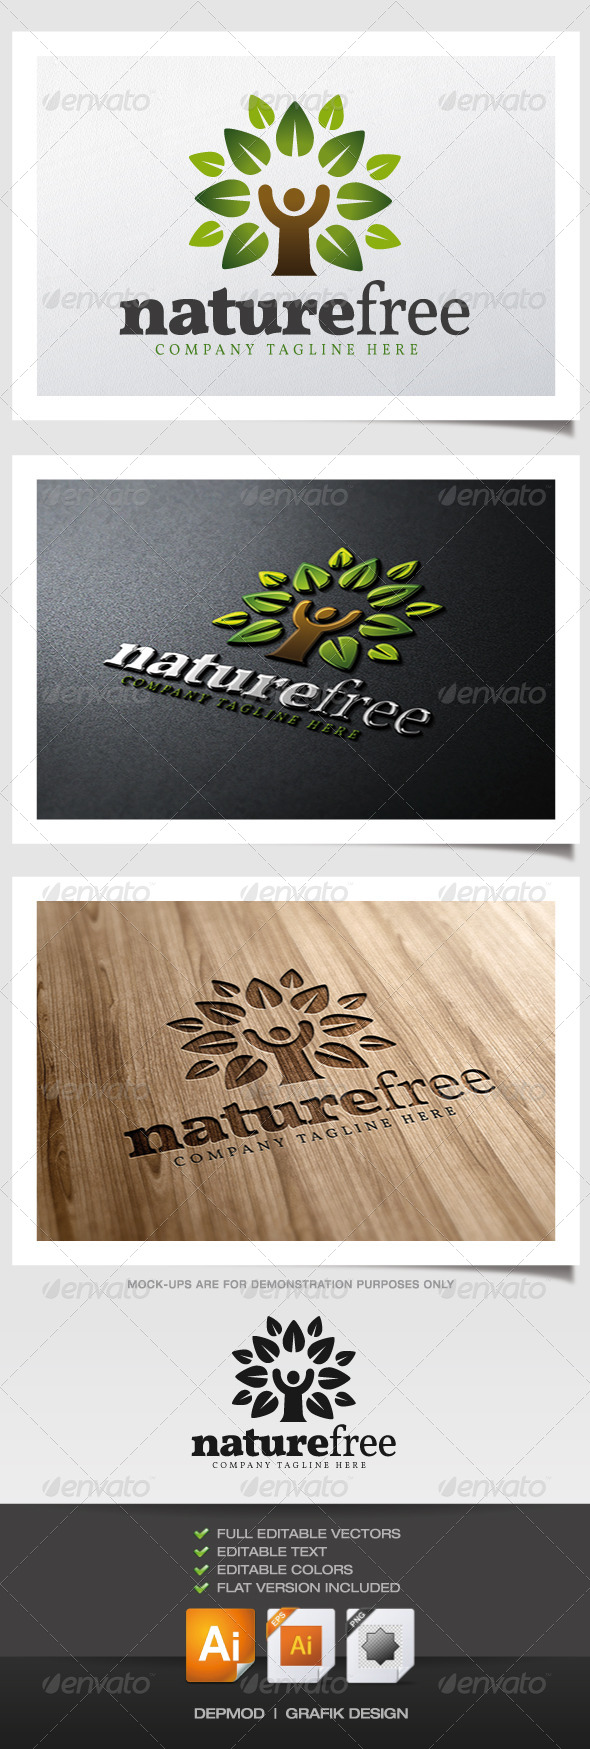 Nature Free Logo - Nature Logo Templates